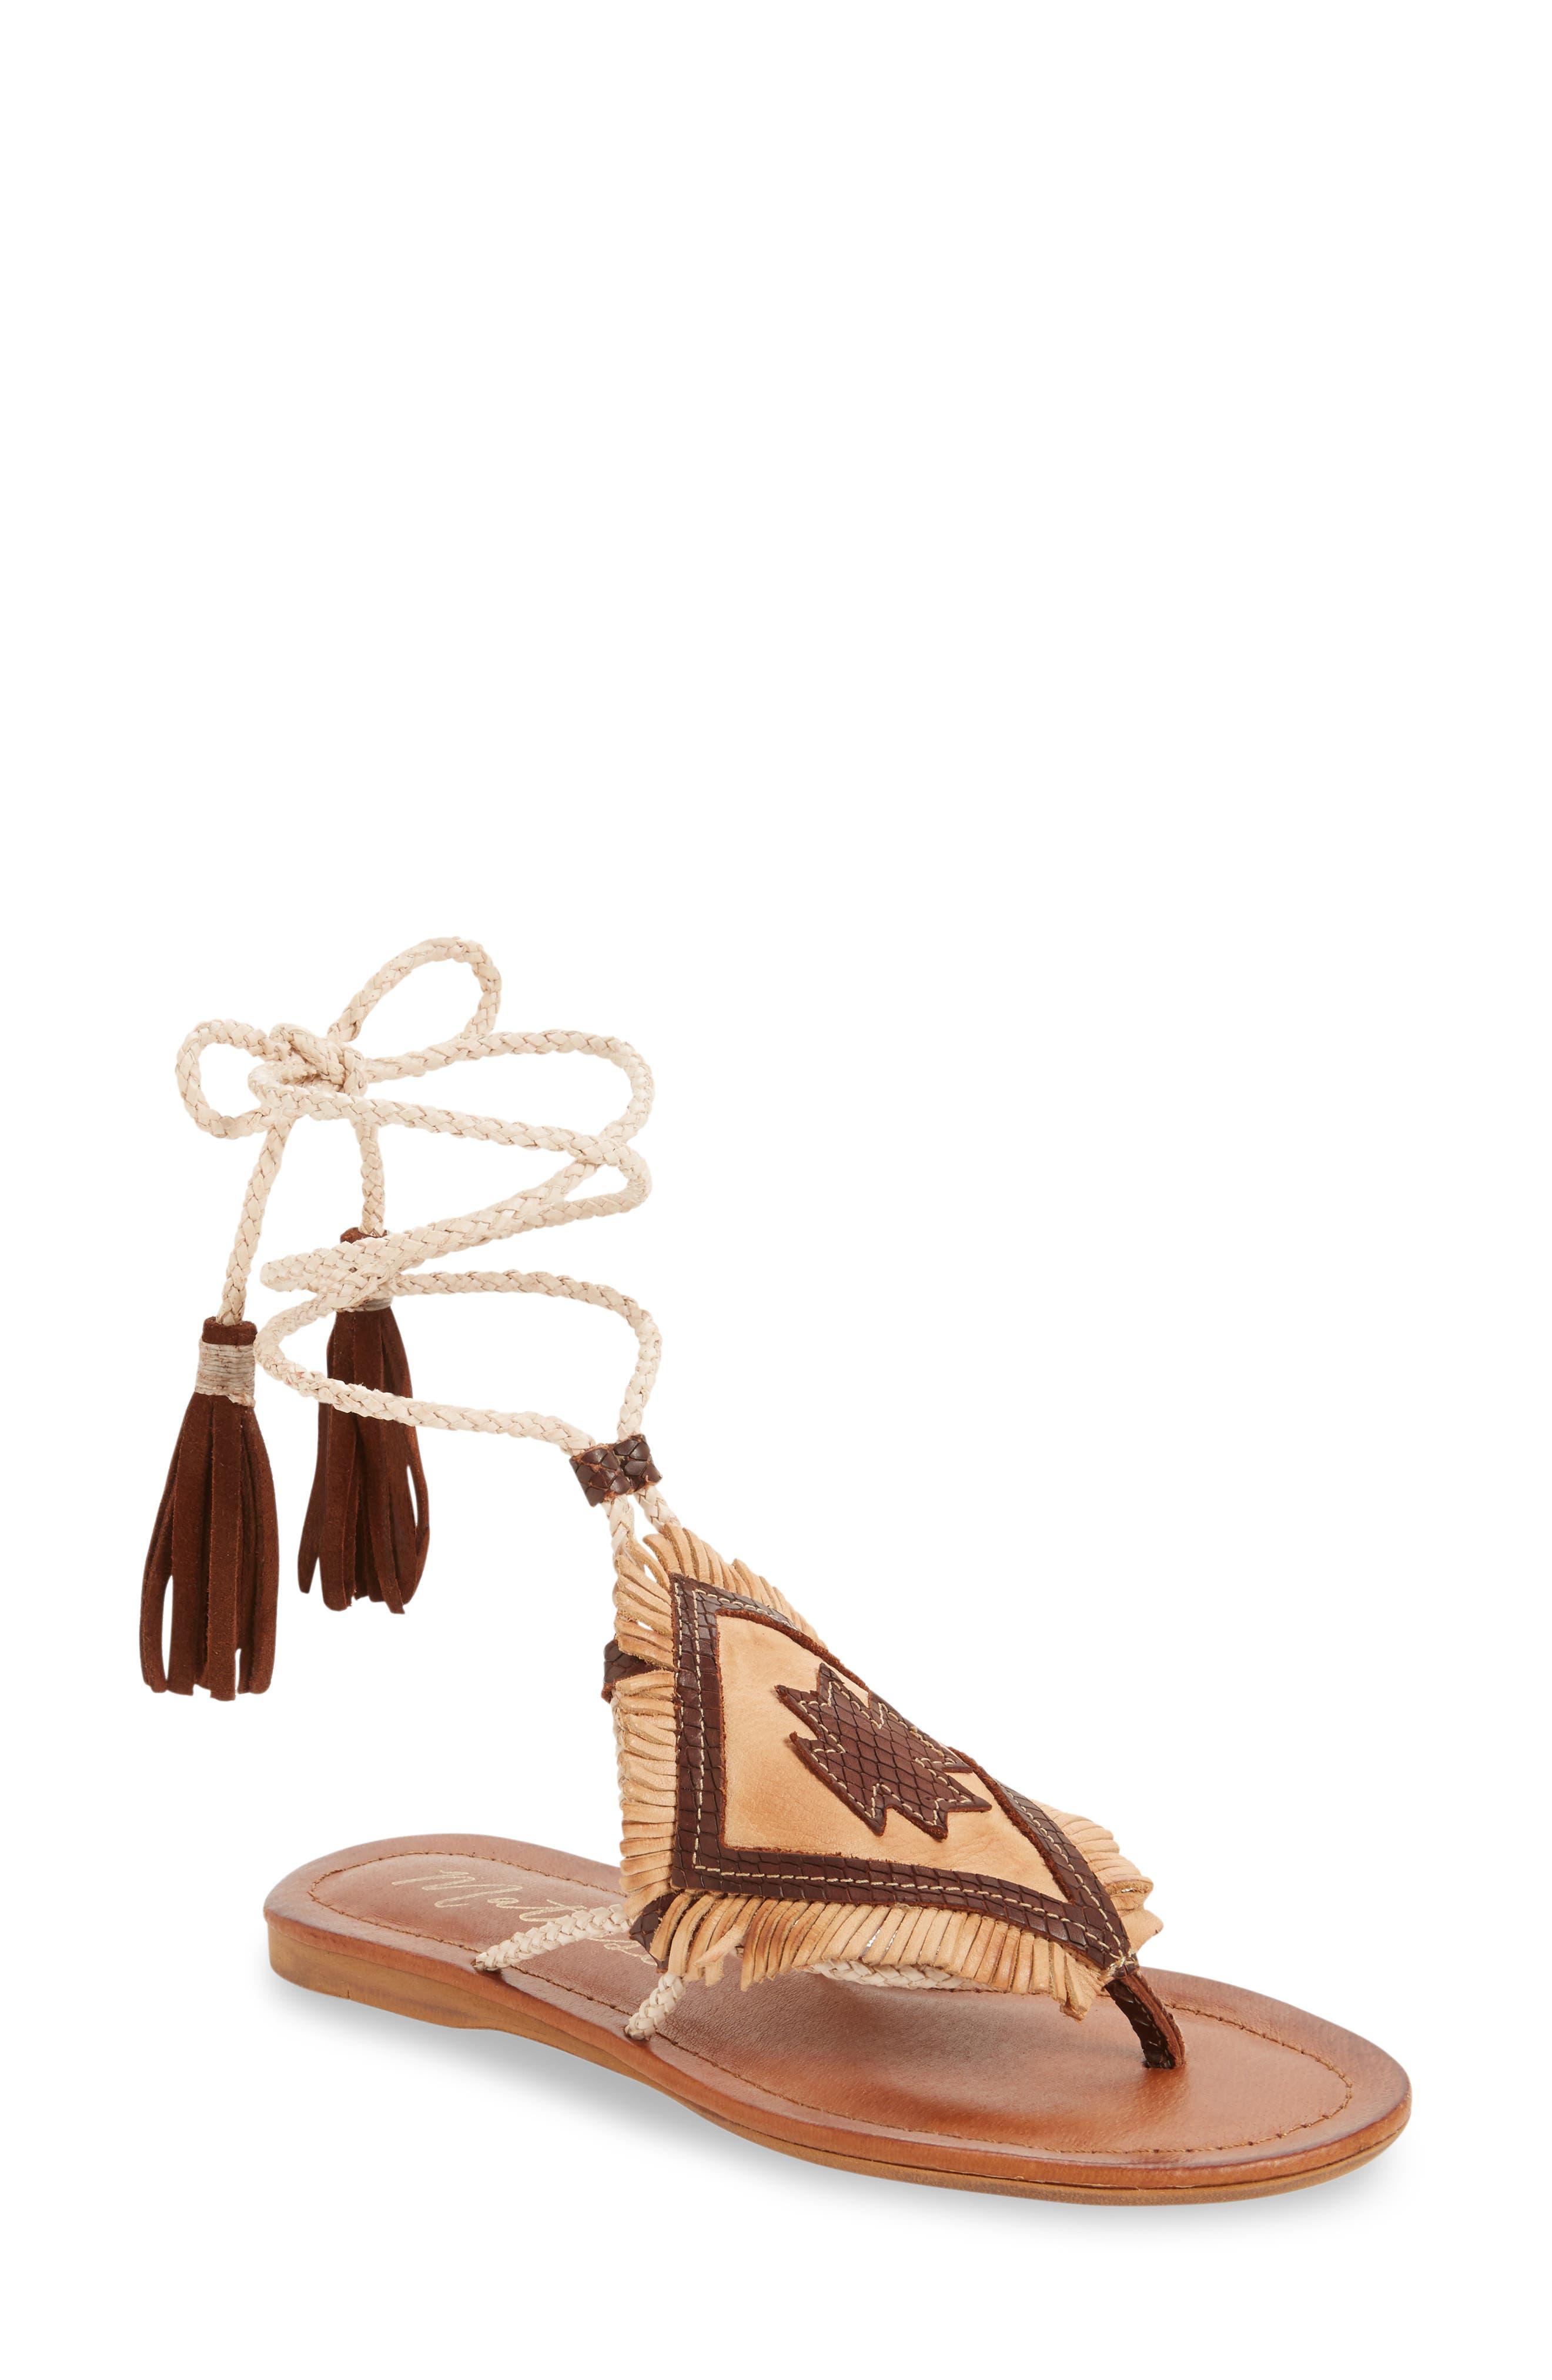 Bronte Tassel Lace-Up Sandal,                         Main,                         color, 250